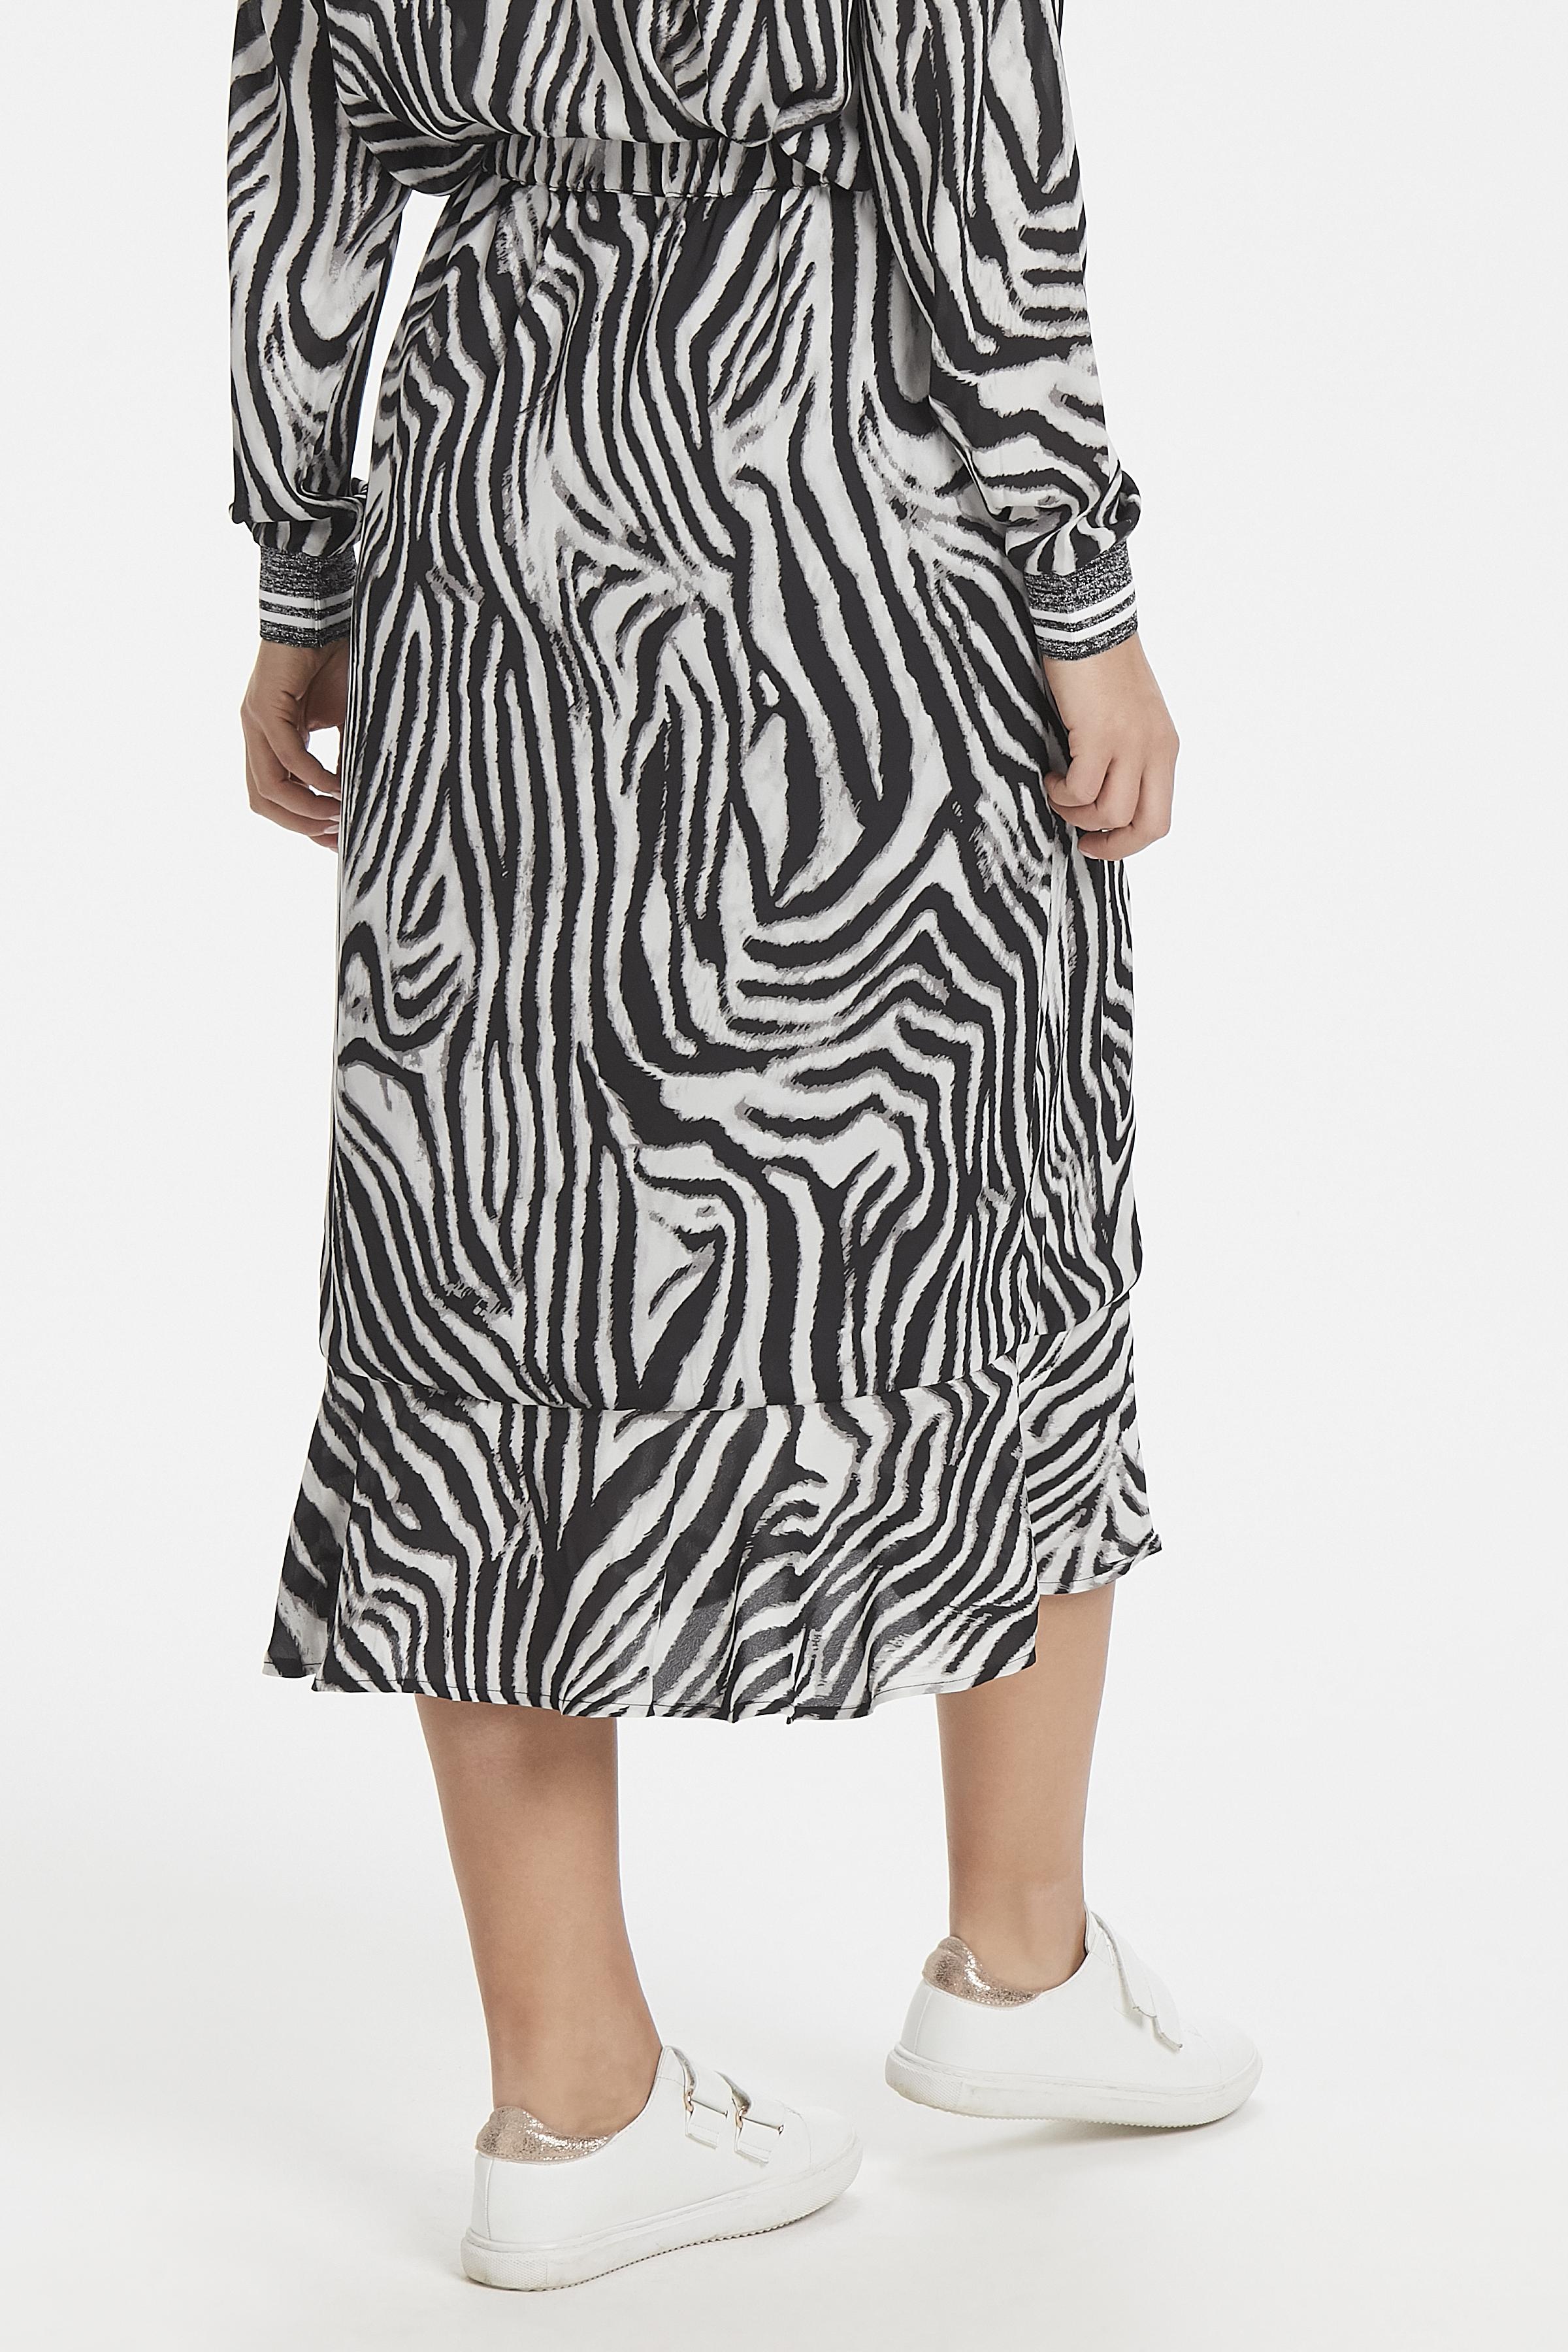 Zebra combi 1 Skirt from b.young – Buy Zebra combi 1 Skirt from size 34-42 here